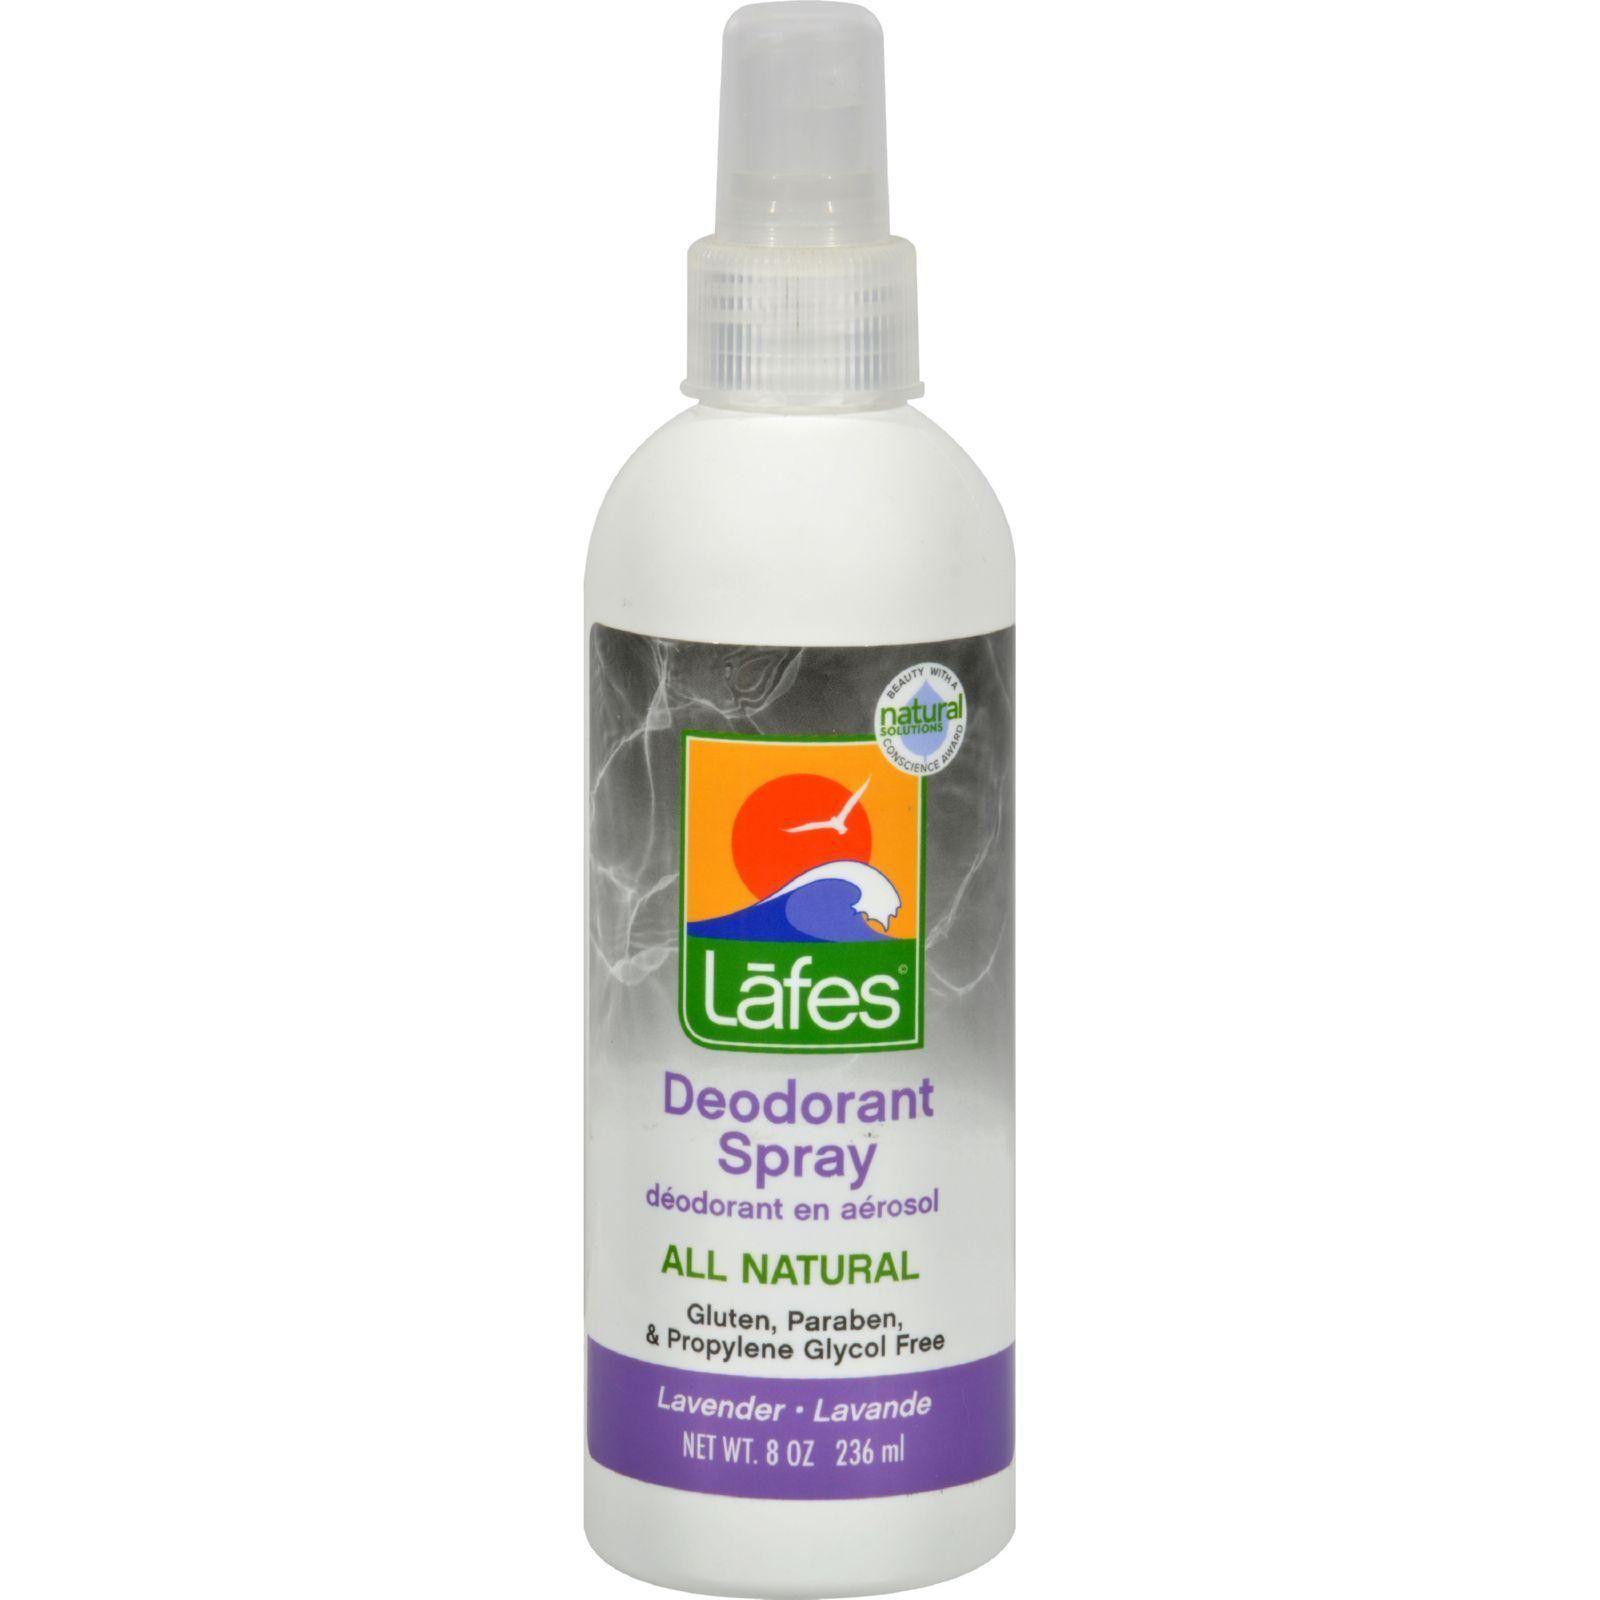 Lafes deodorant spray lavender 8 fl oz deodorant